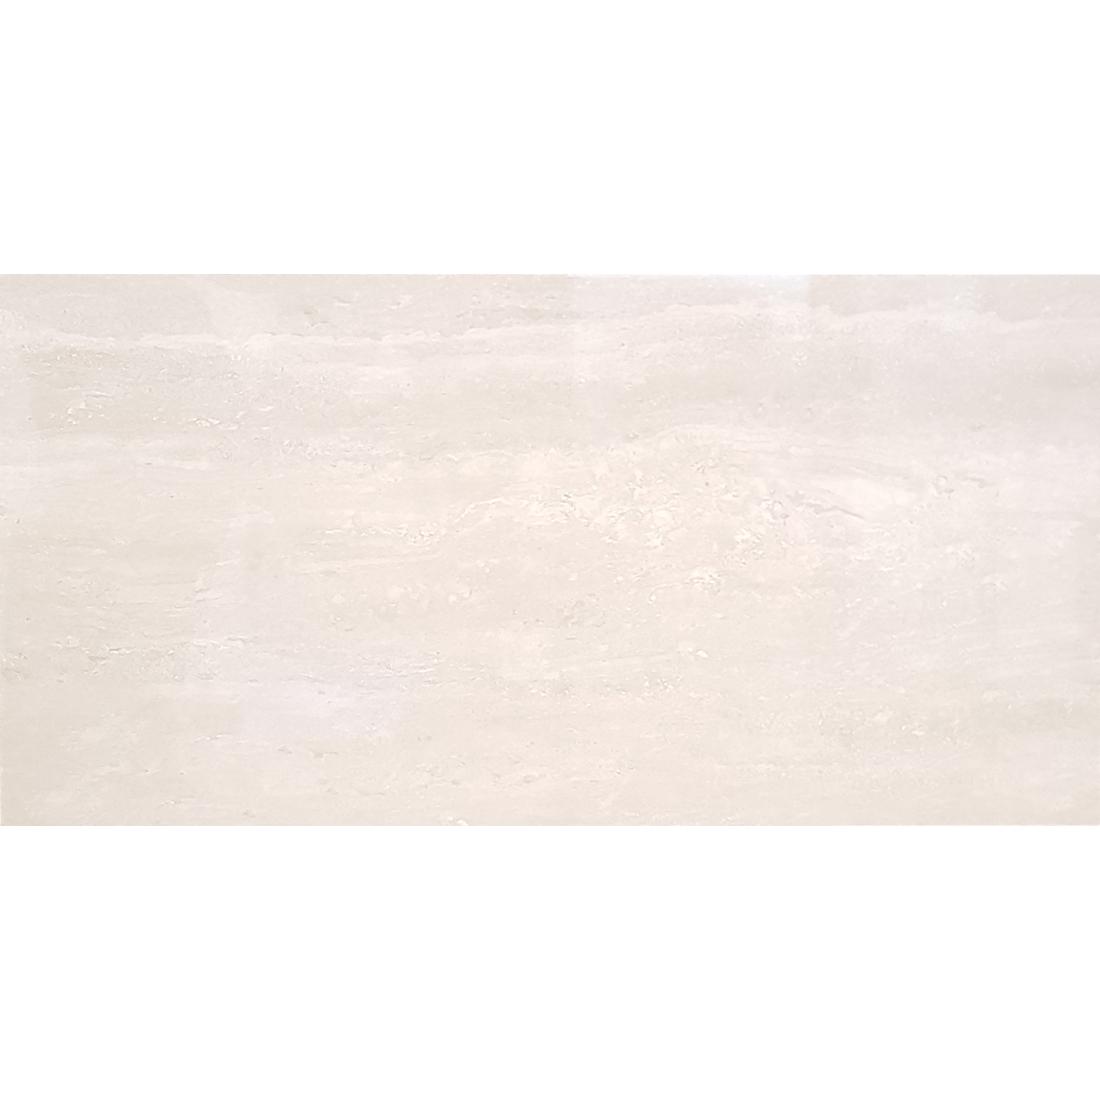 Super Travertine 30x60 Ivory Gloss 1